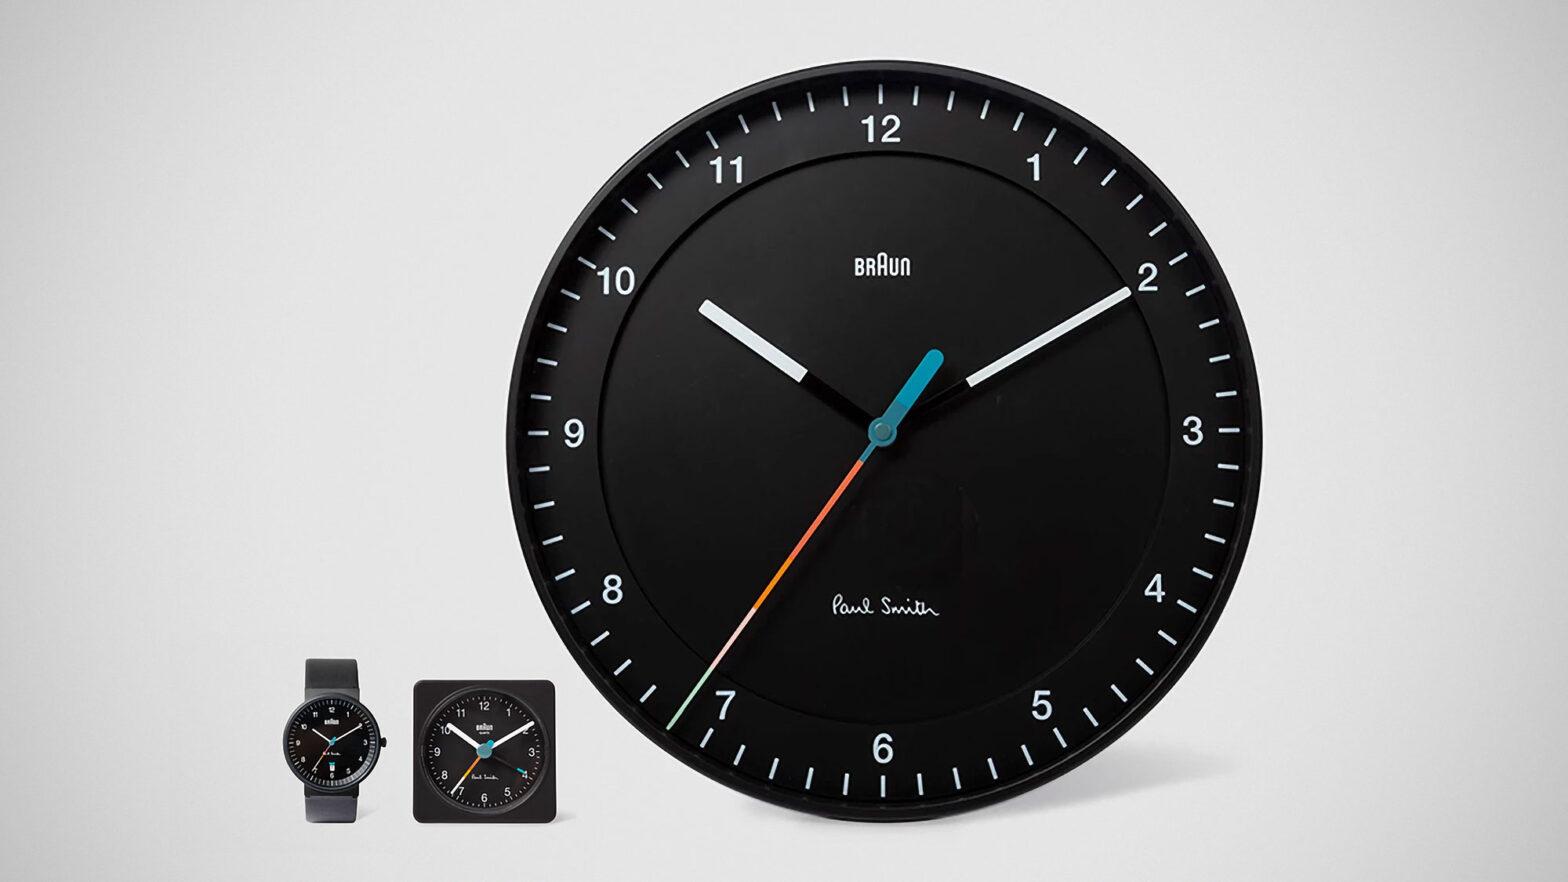 Paul Smith + Braun Wrist Watch and Clocks